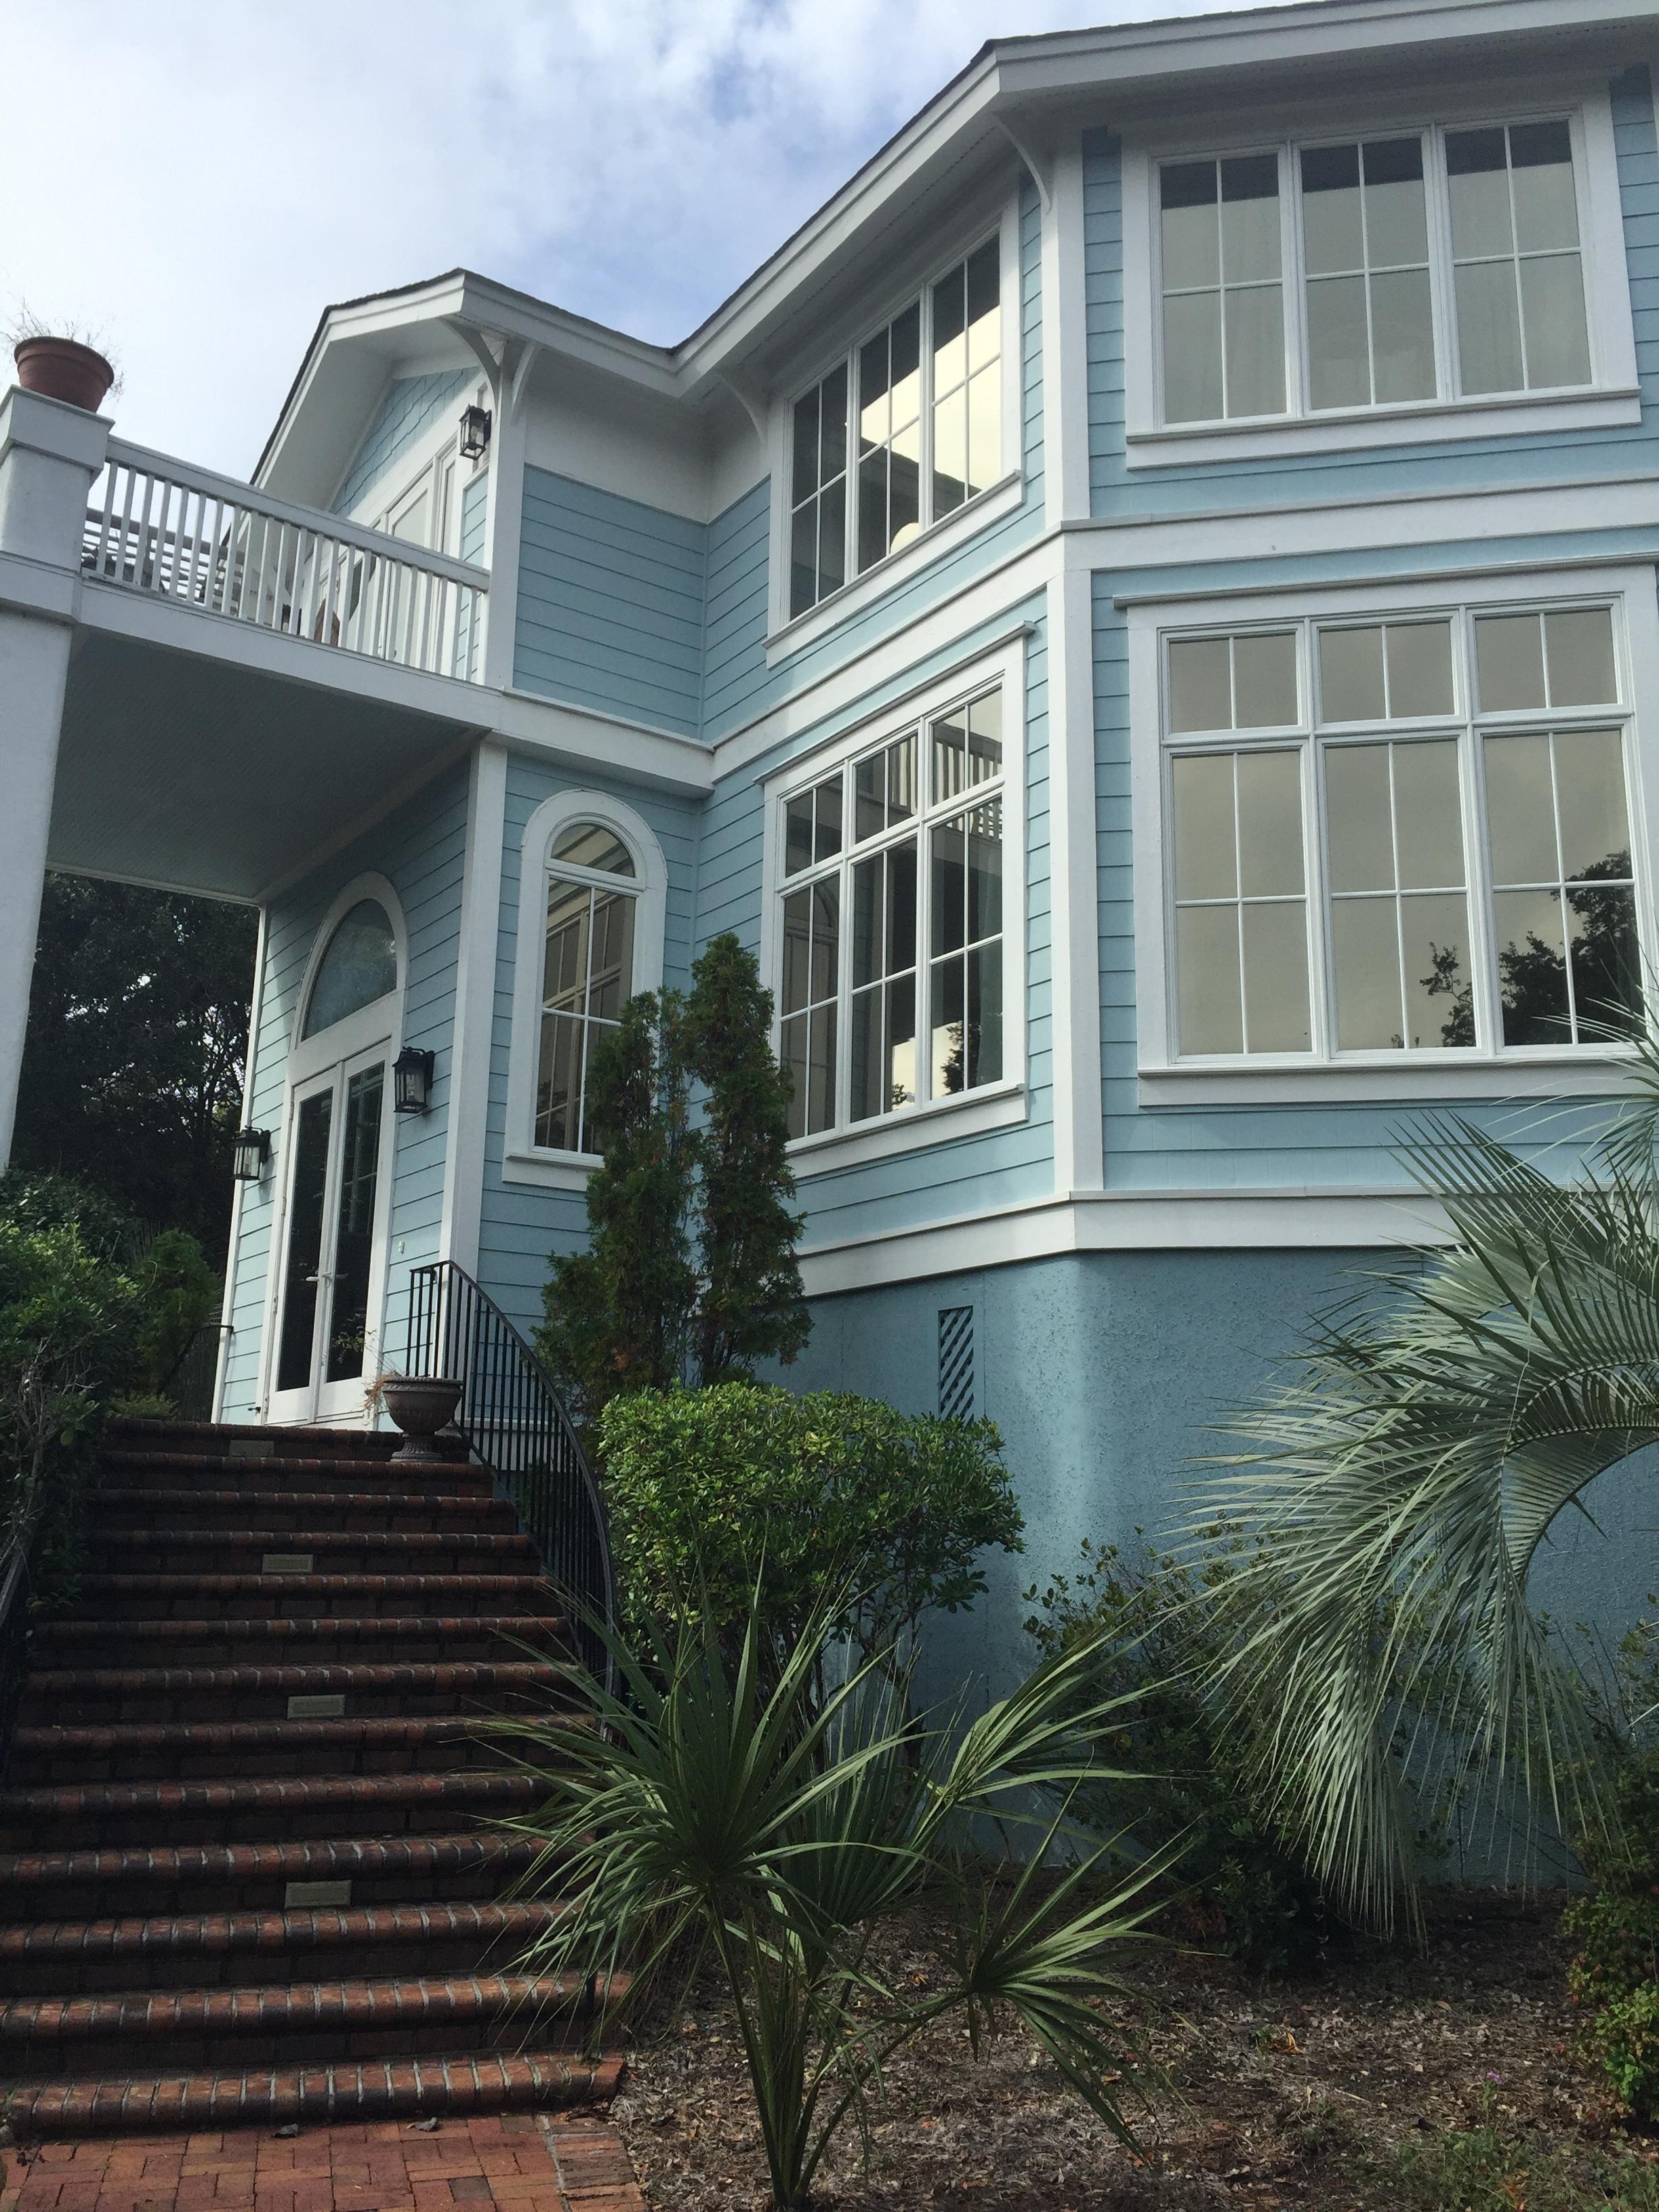 Wanderlust-blog-Wild-Dunes-South-Carolina-building-blue